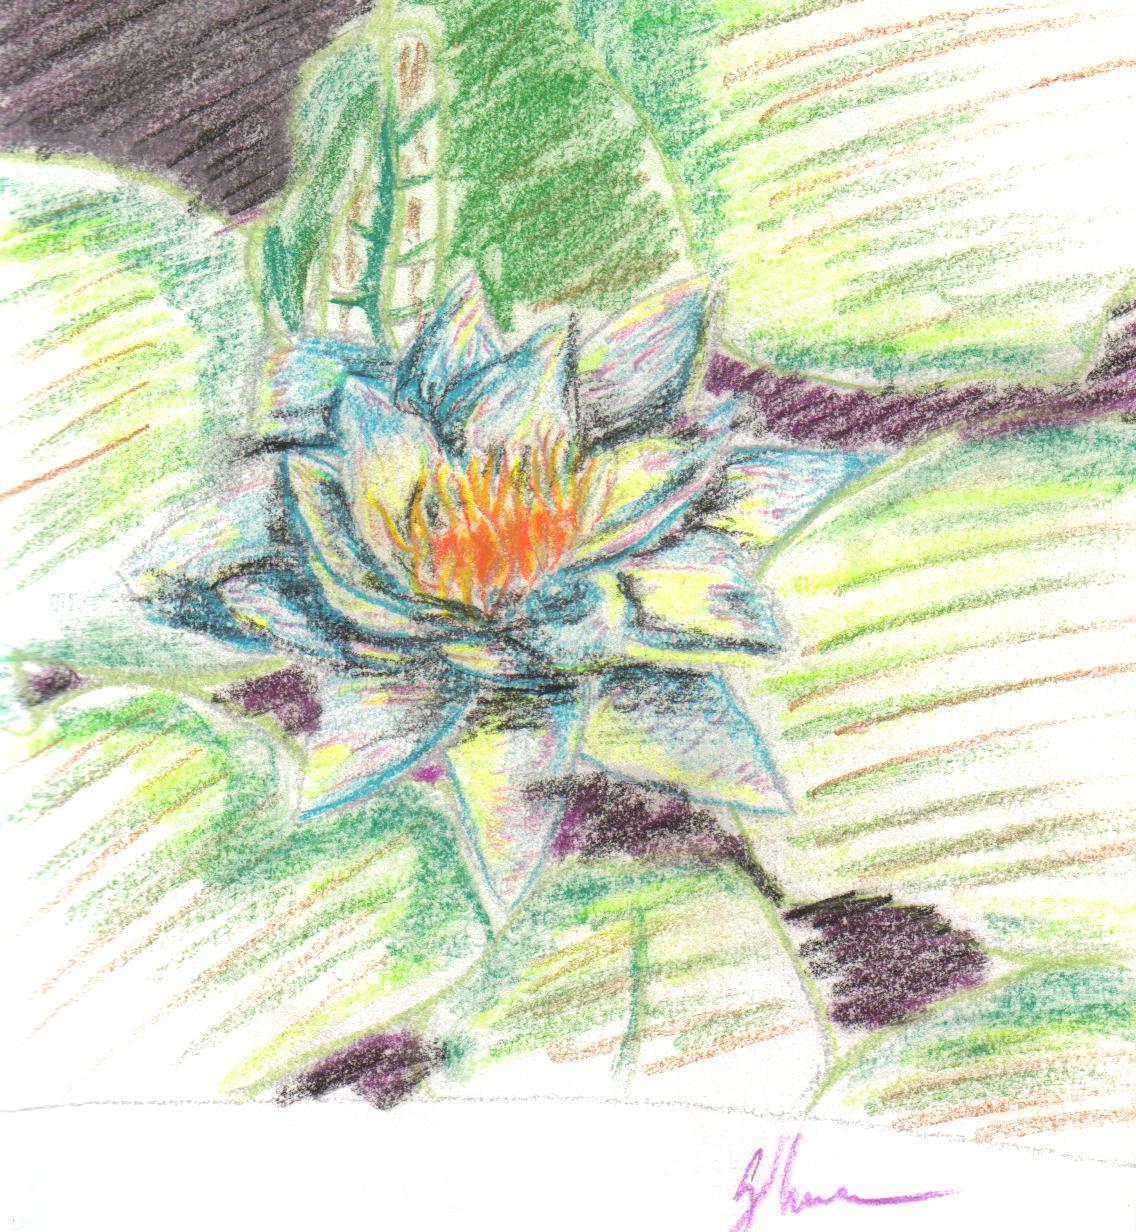 Lily flower by chotakana on